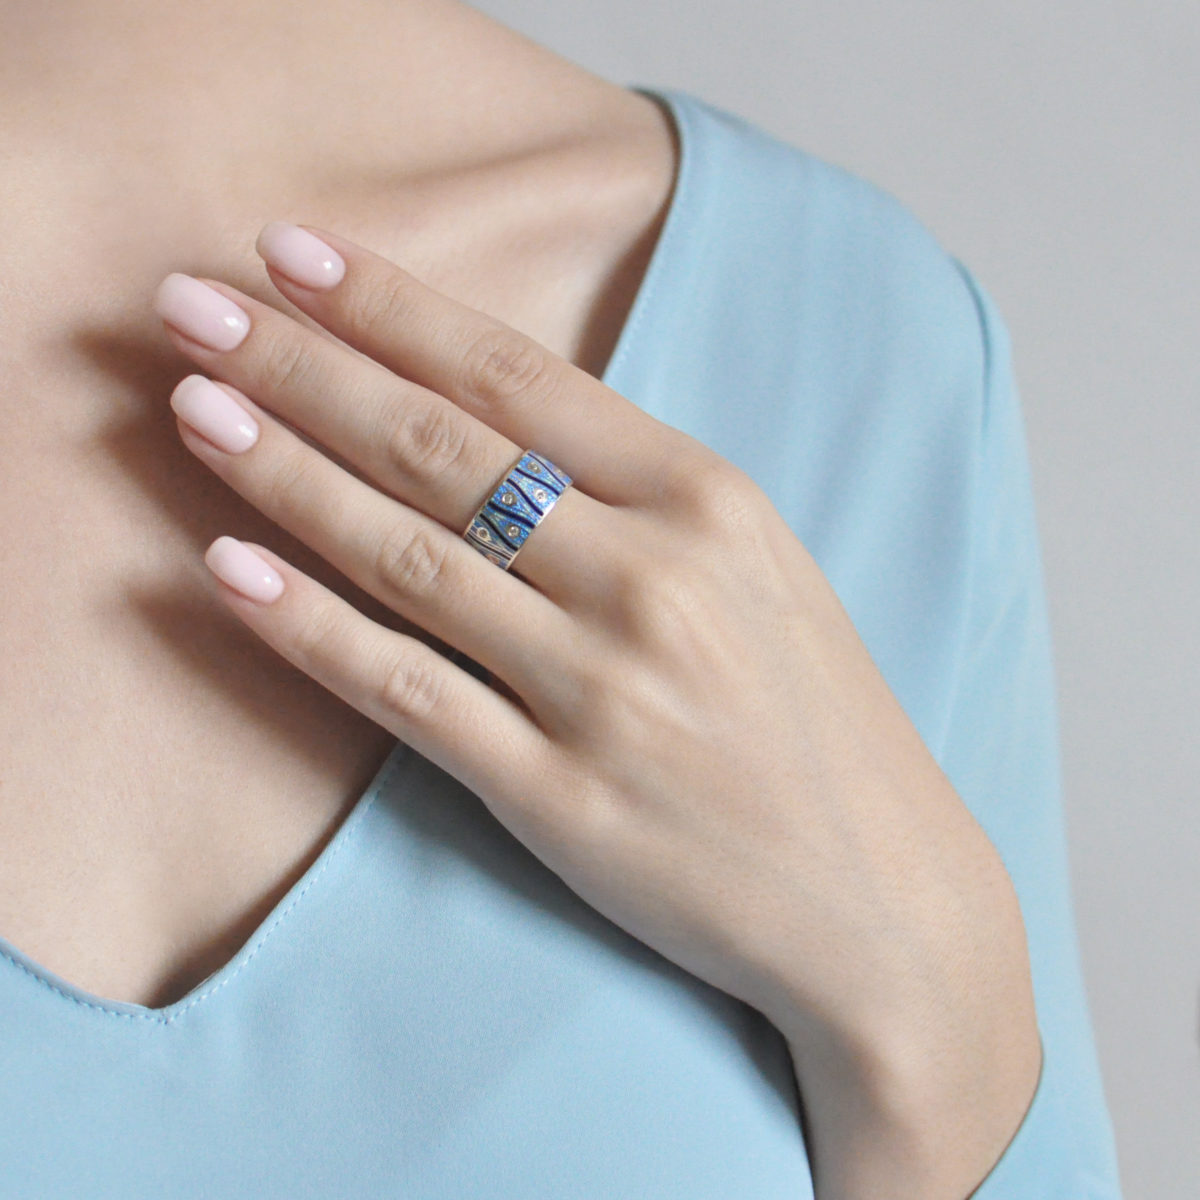 pero pavlina 6.93 sinyaya 1200x1200 - Кольцо из серебра «Модерн. Перо павлина», синяя с фианитами